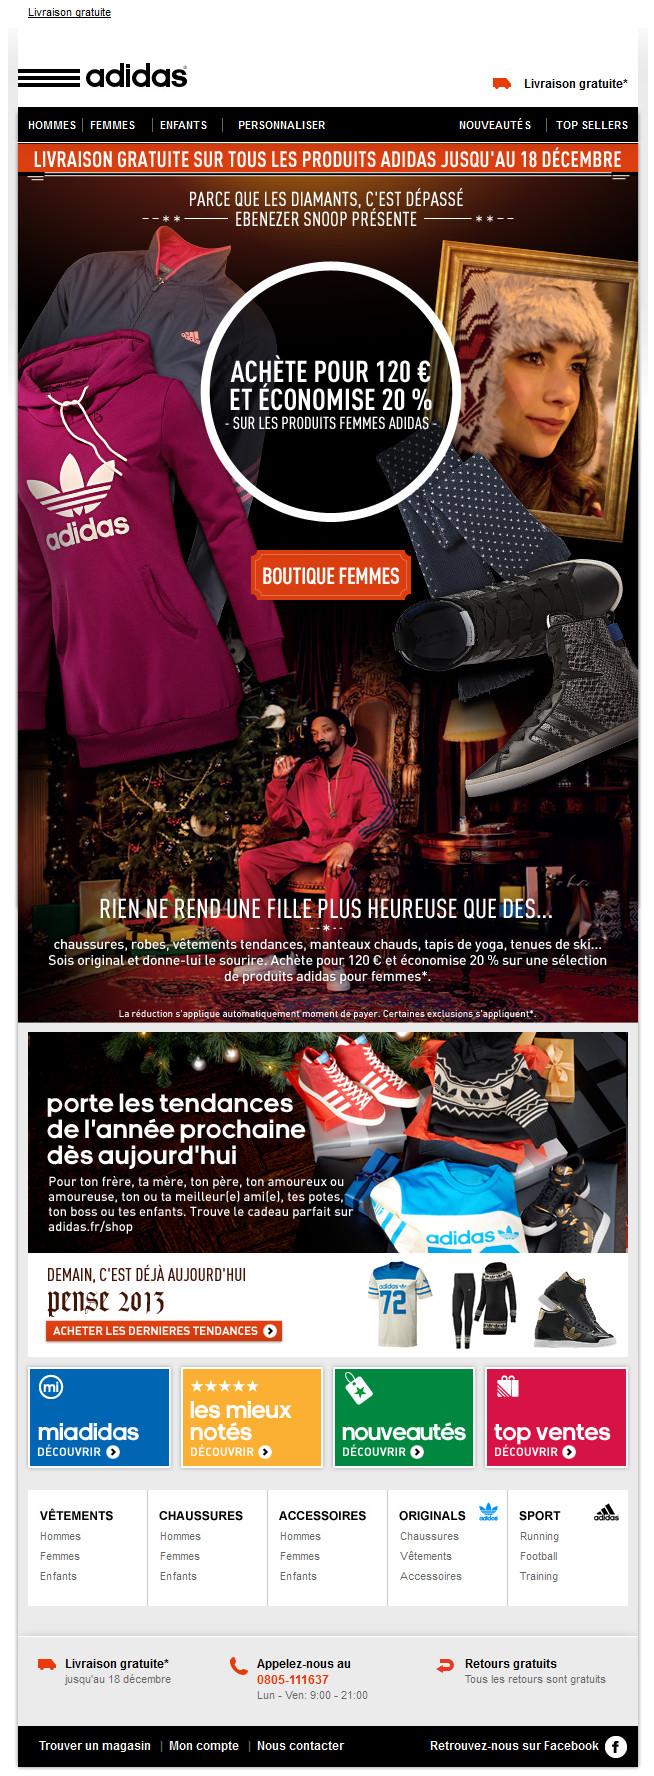 abajo falda rápido  adidas newsletter   Adidou